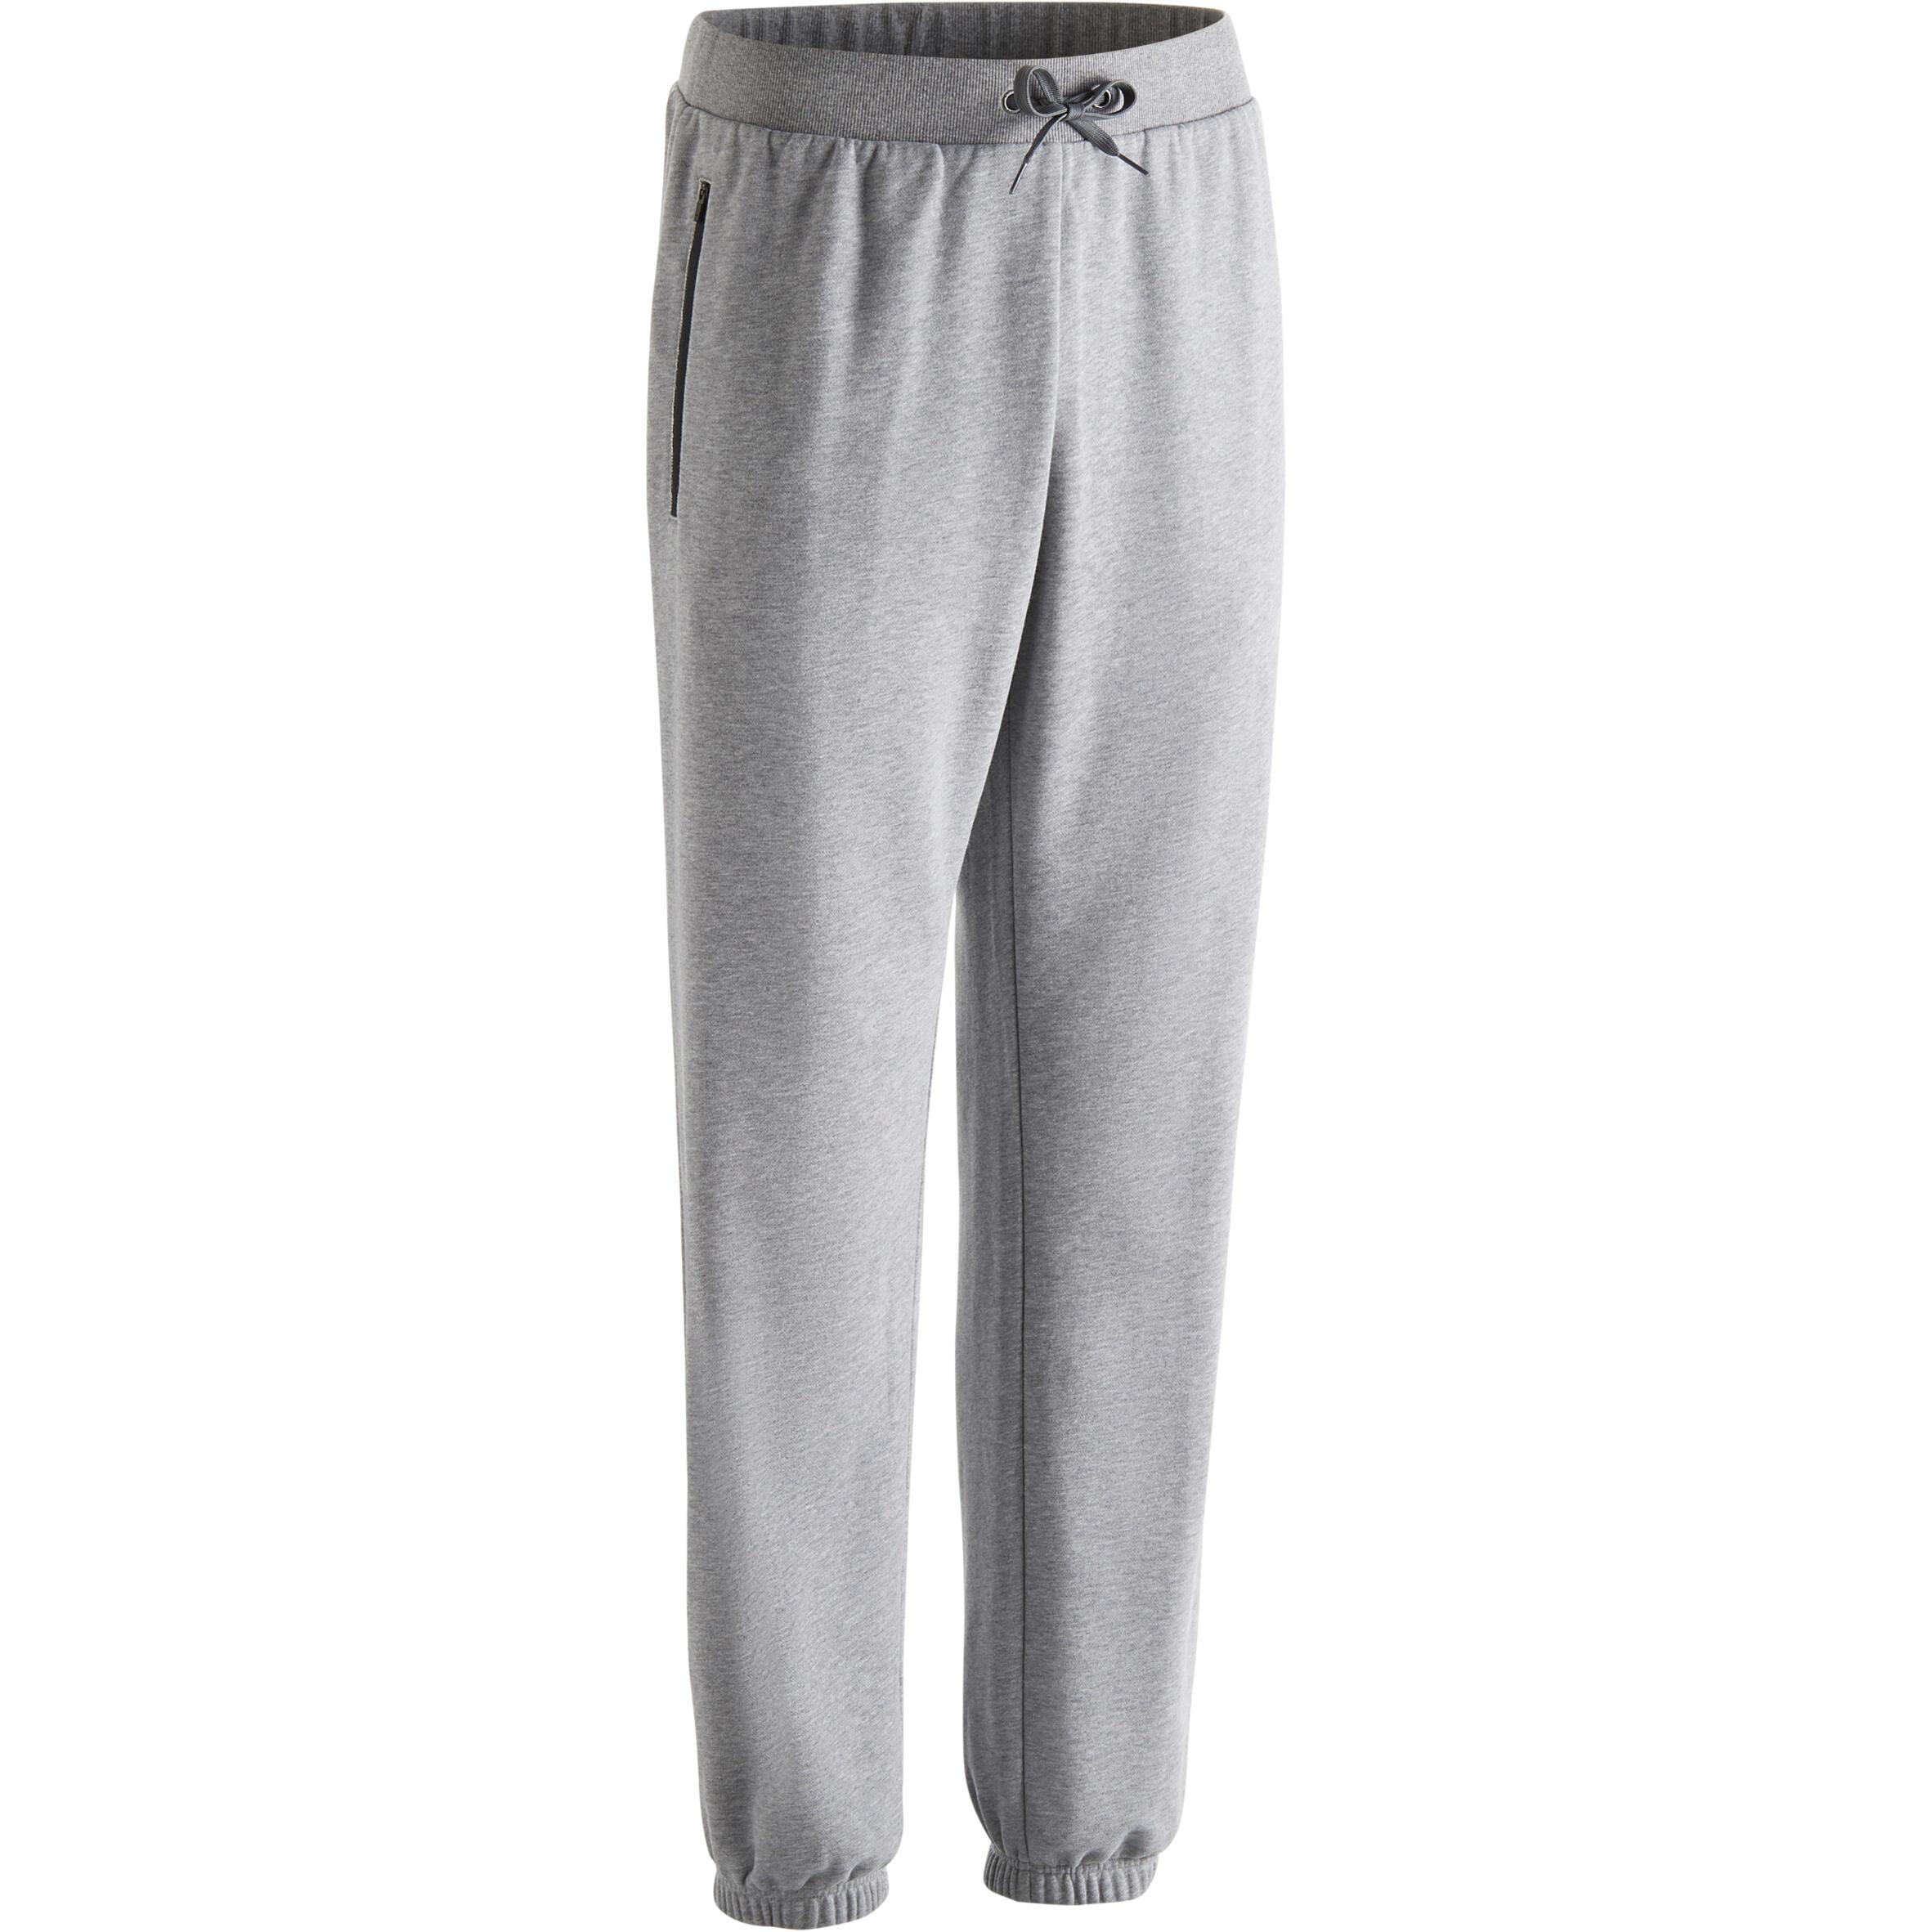 500 Regular-Fit Zipper Gym Stretching Bottoms - Light Heathered Grey